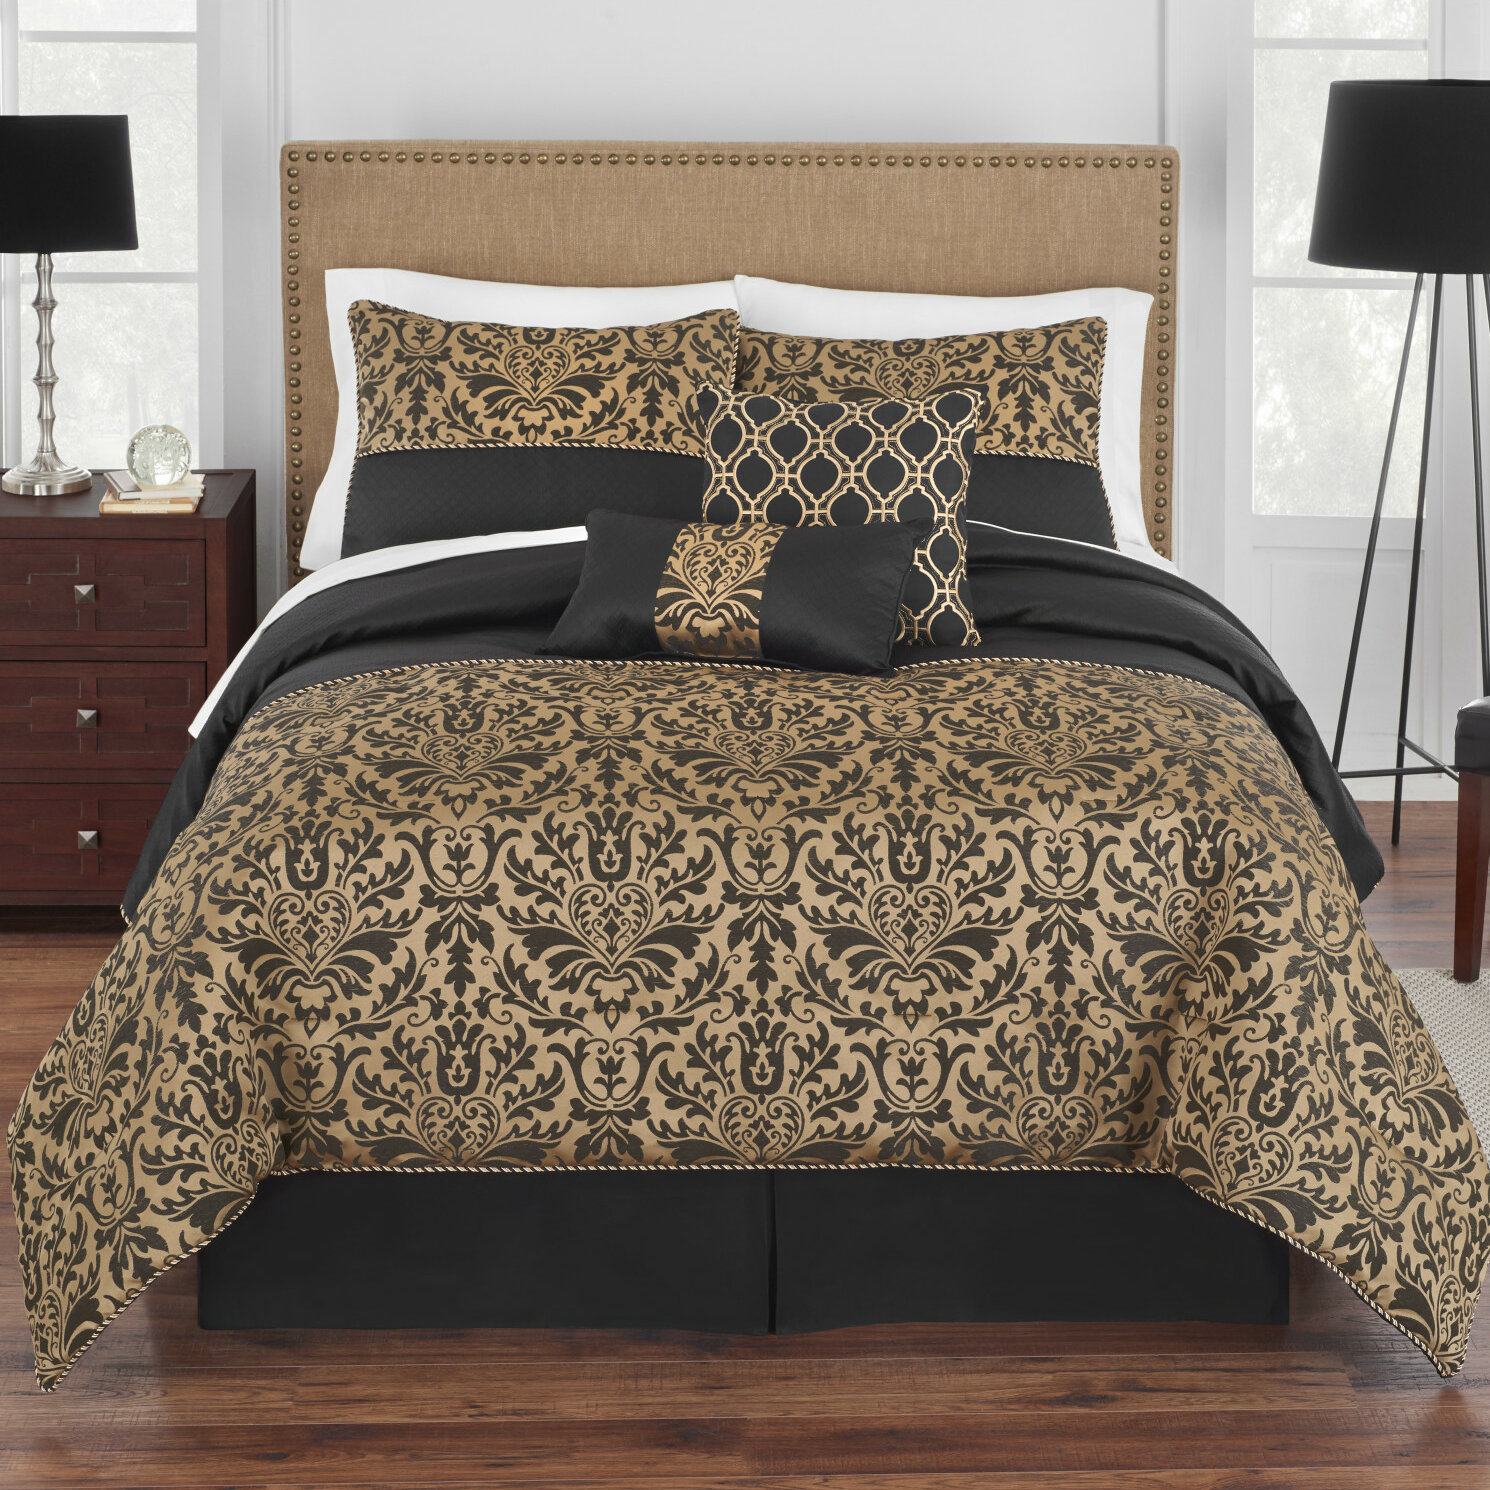 Grand Patrician Grand Genevieve Comforter Set Reviews Wayfair